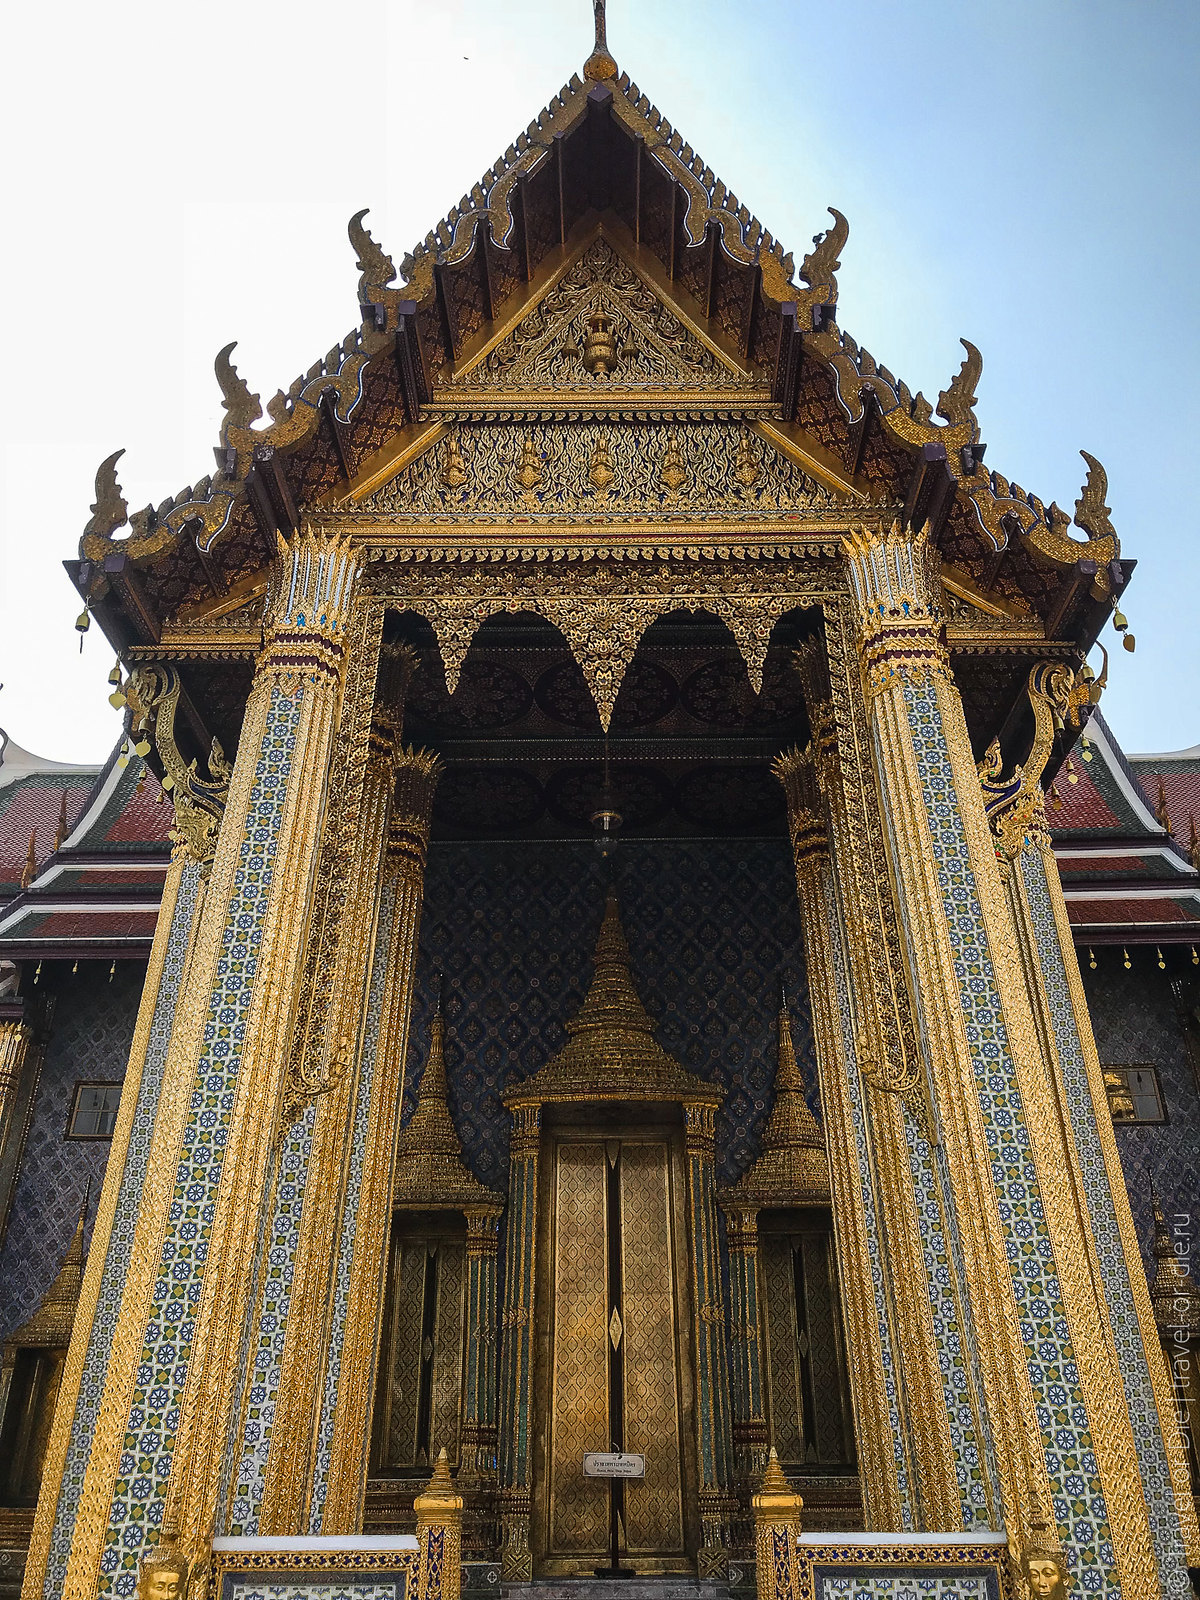 Grand-Palace-Bangkok-Королевский-дворец-Бангкок-9185